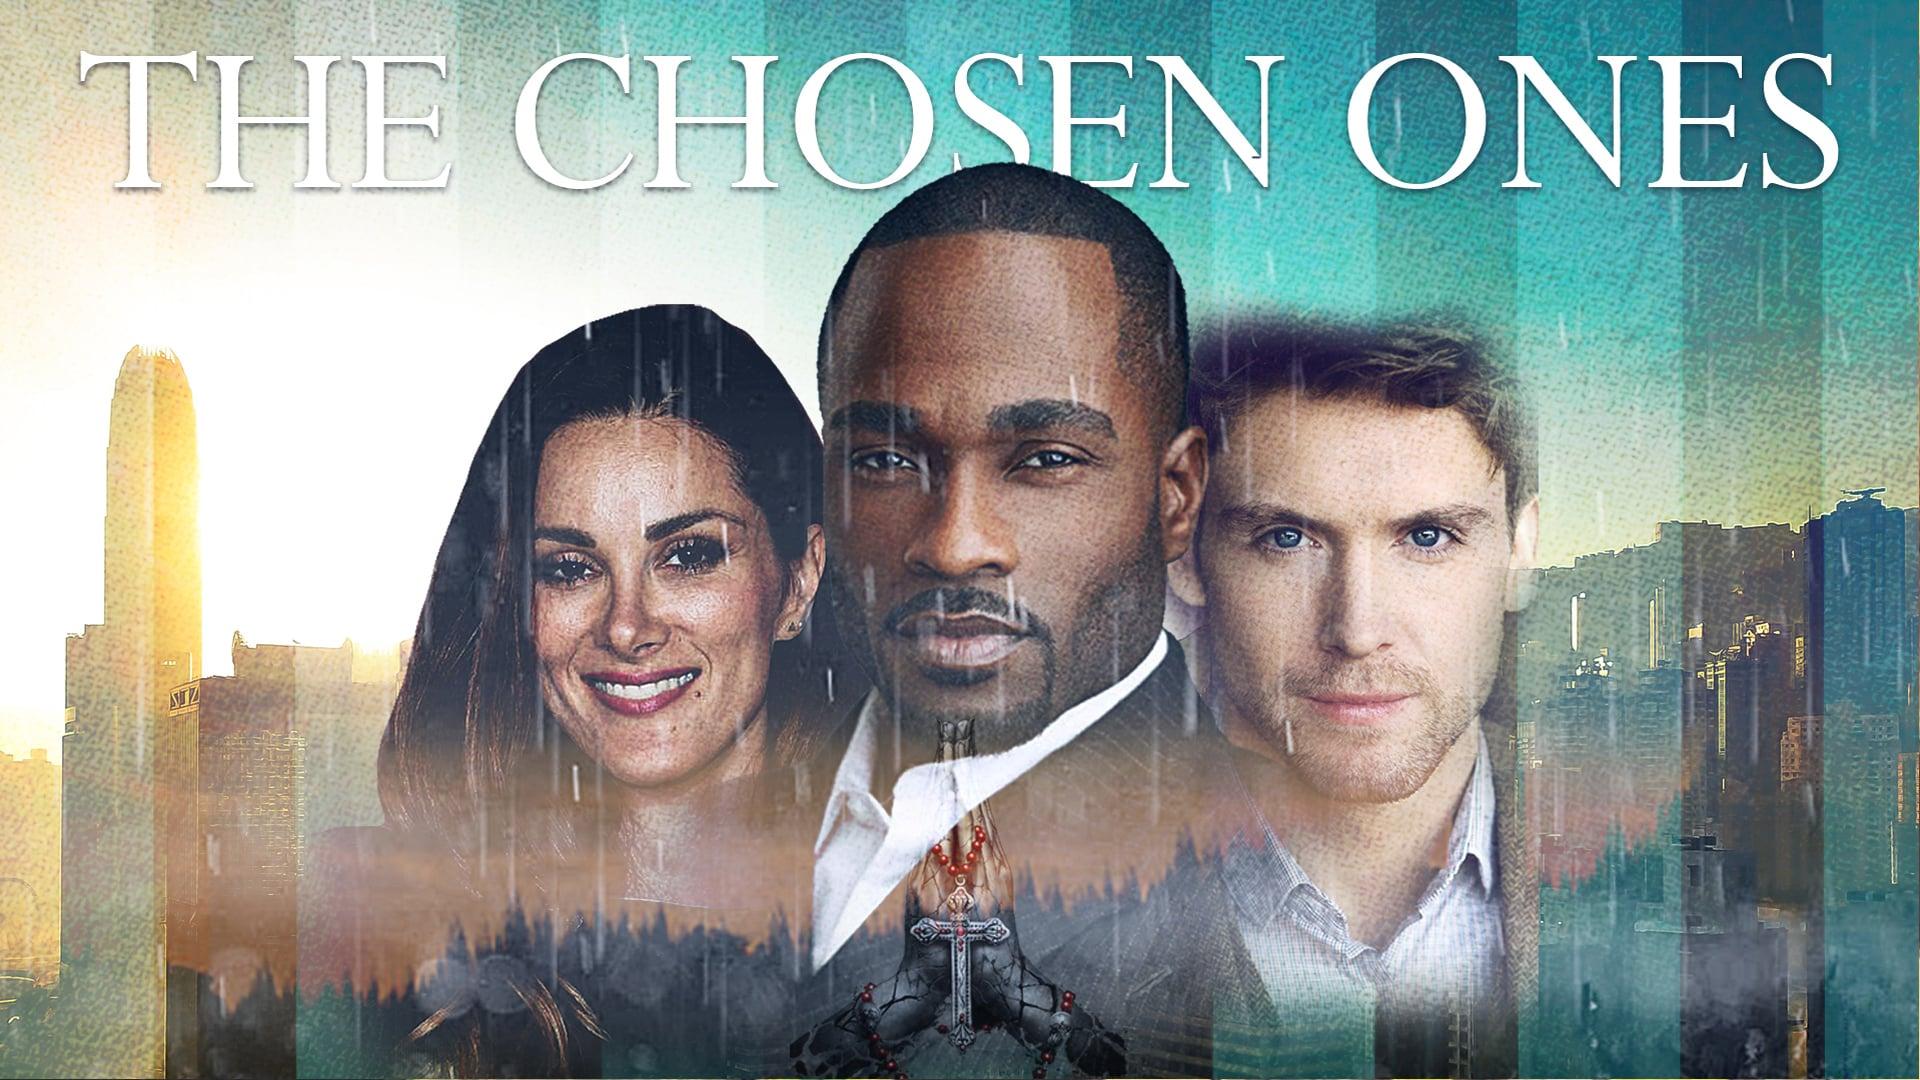 The Chosen Ones – Movie